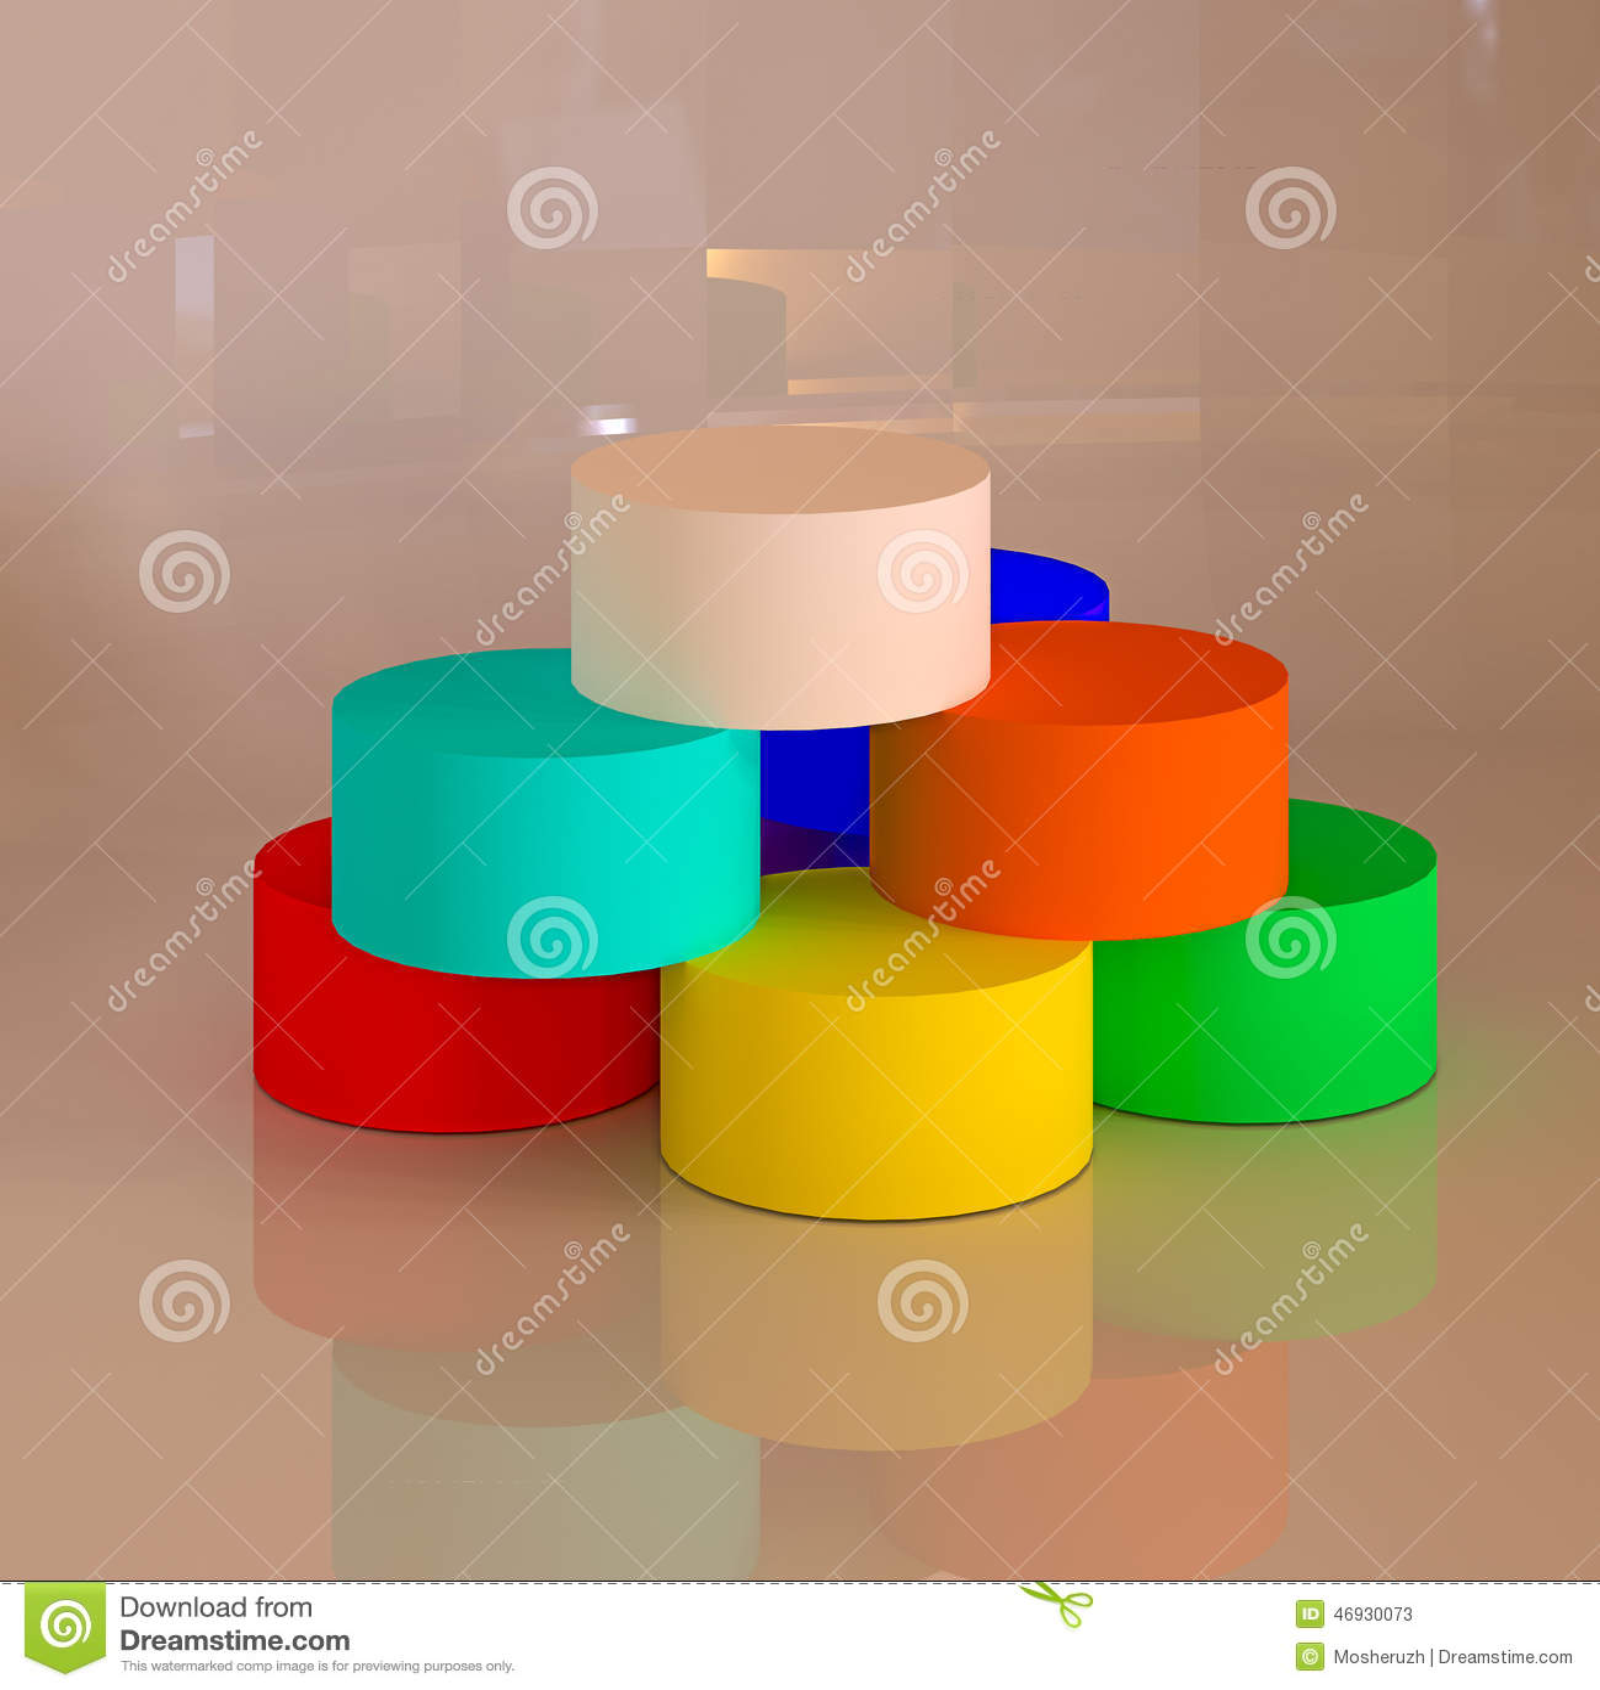 Formas geom tricas abstractas 3d cilindros stock de for Imagenes abstractas 3d